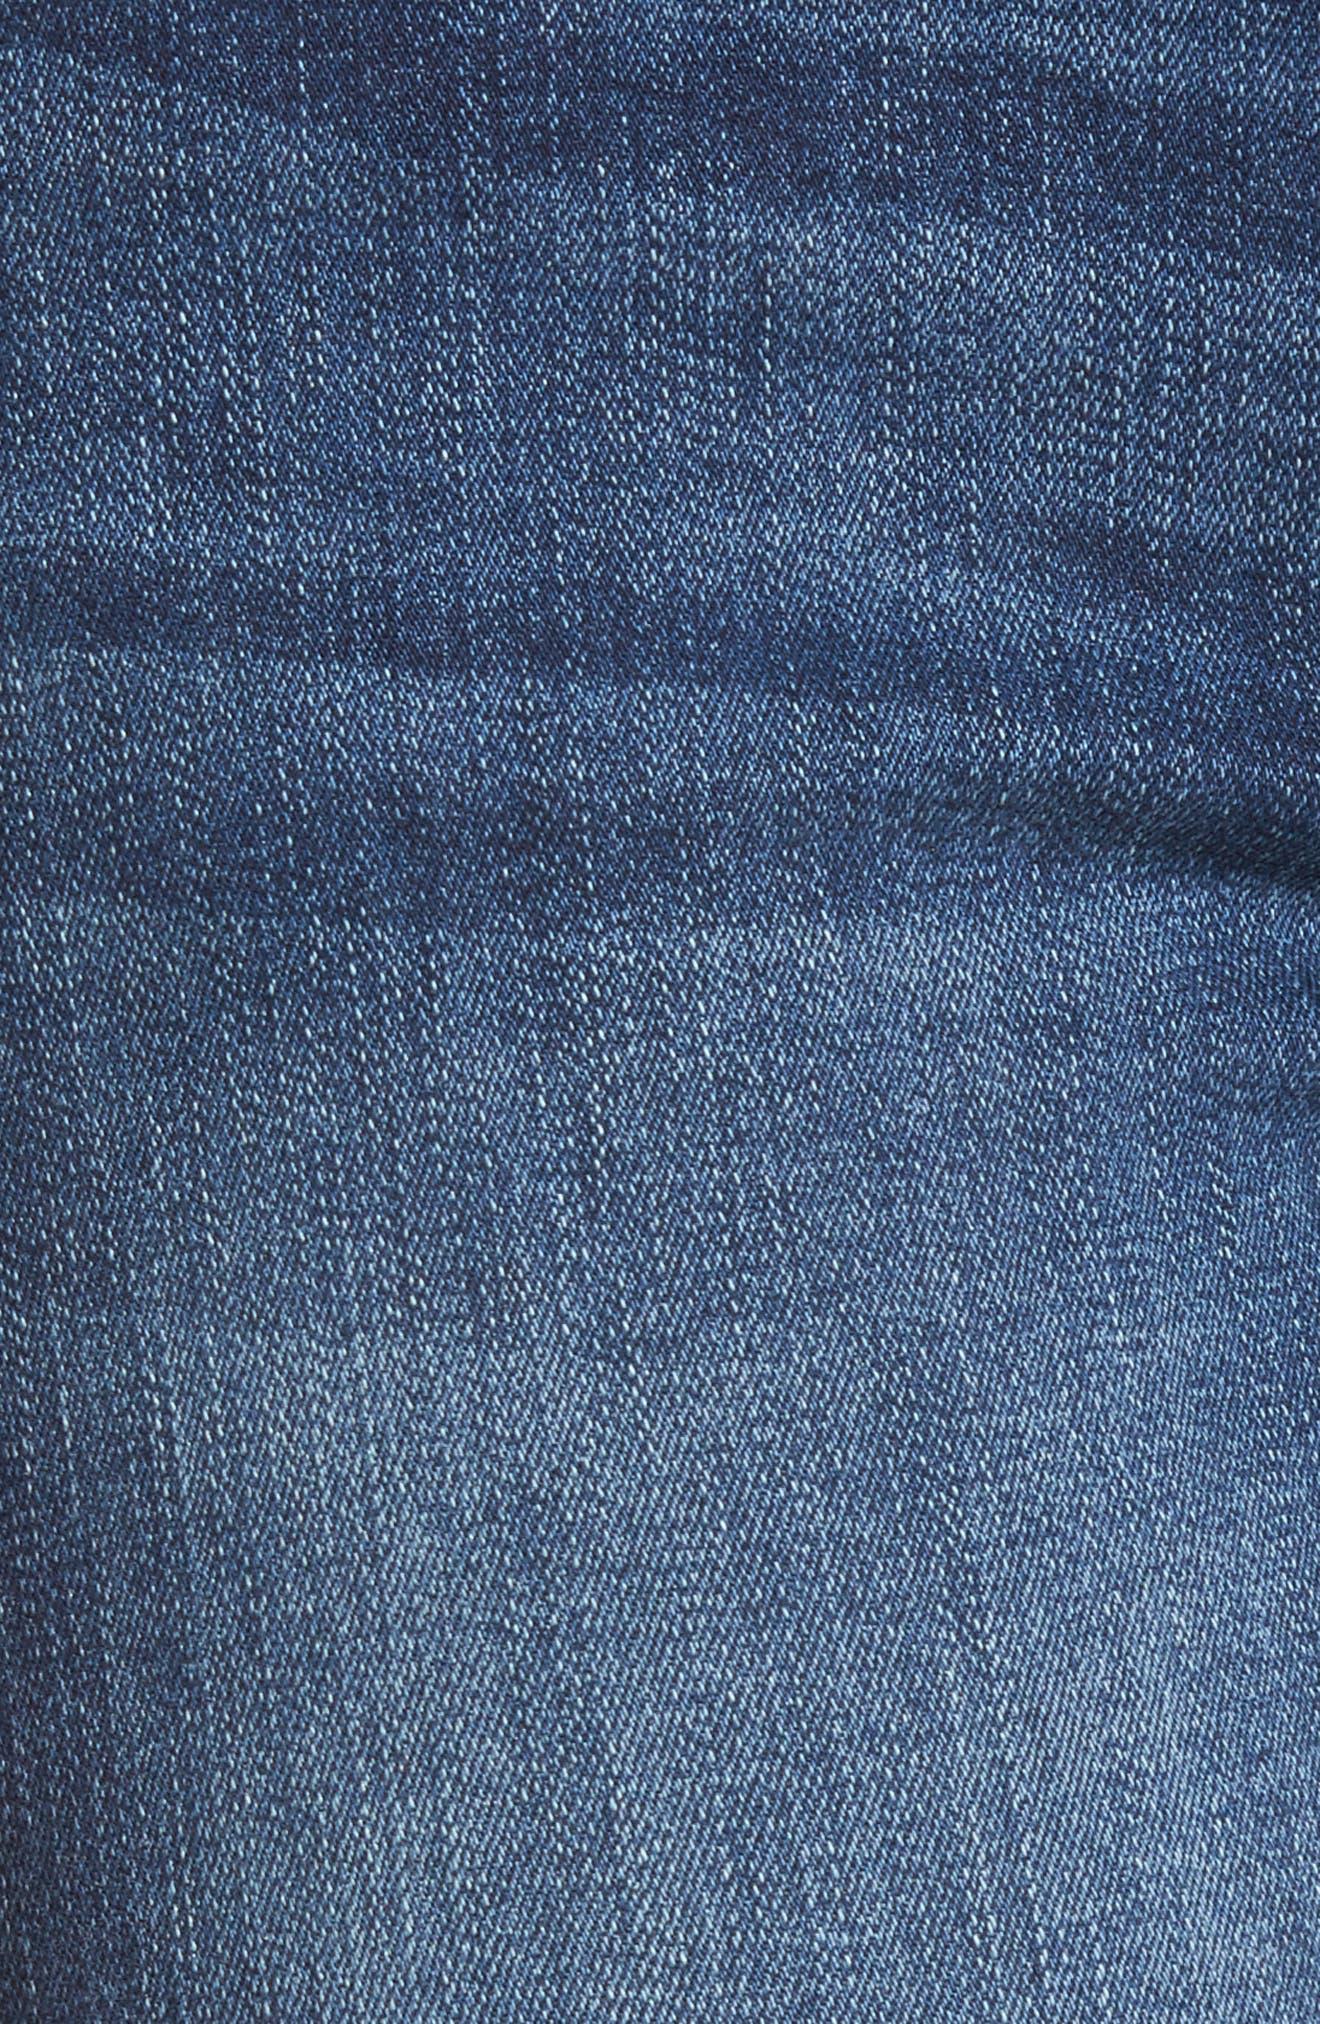 Emma Power Legging Jeans,                             Alternate thumbnail 4, color,                             Fenwick